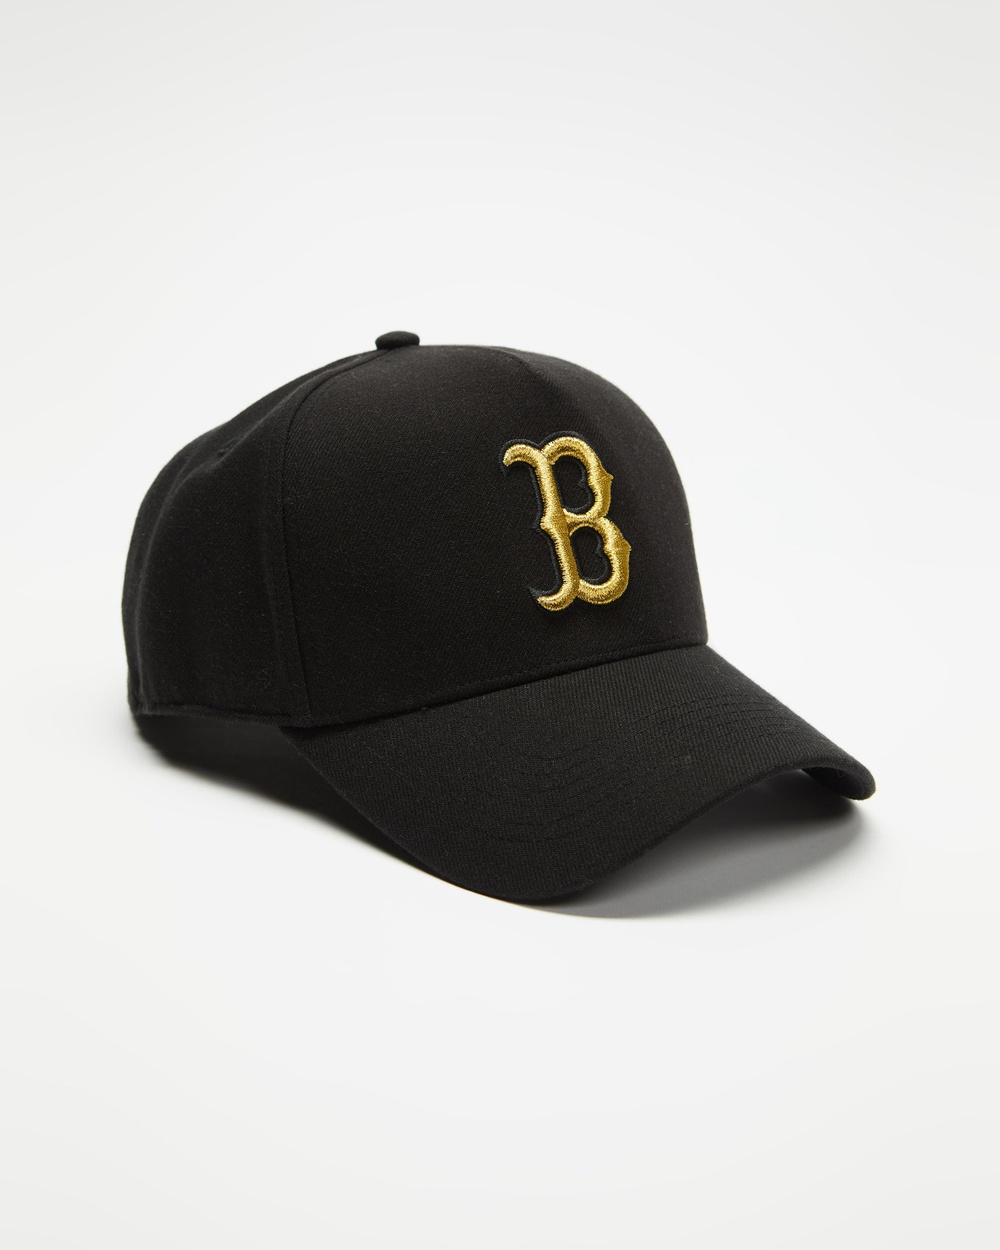 47 Boston Red Sox Metallic 47 MVP DT Snapback Headwear Black & Gold